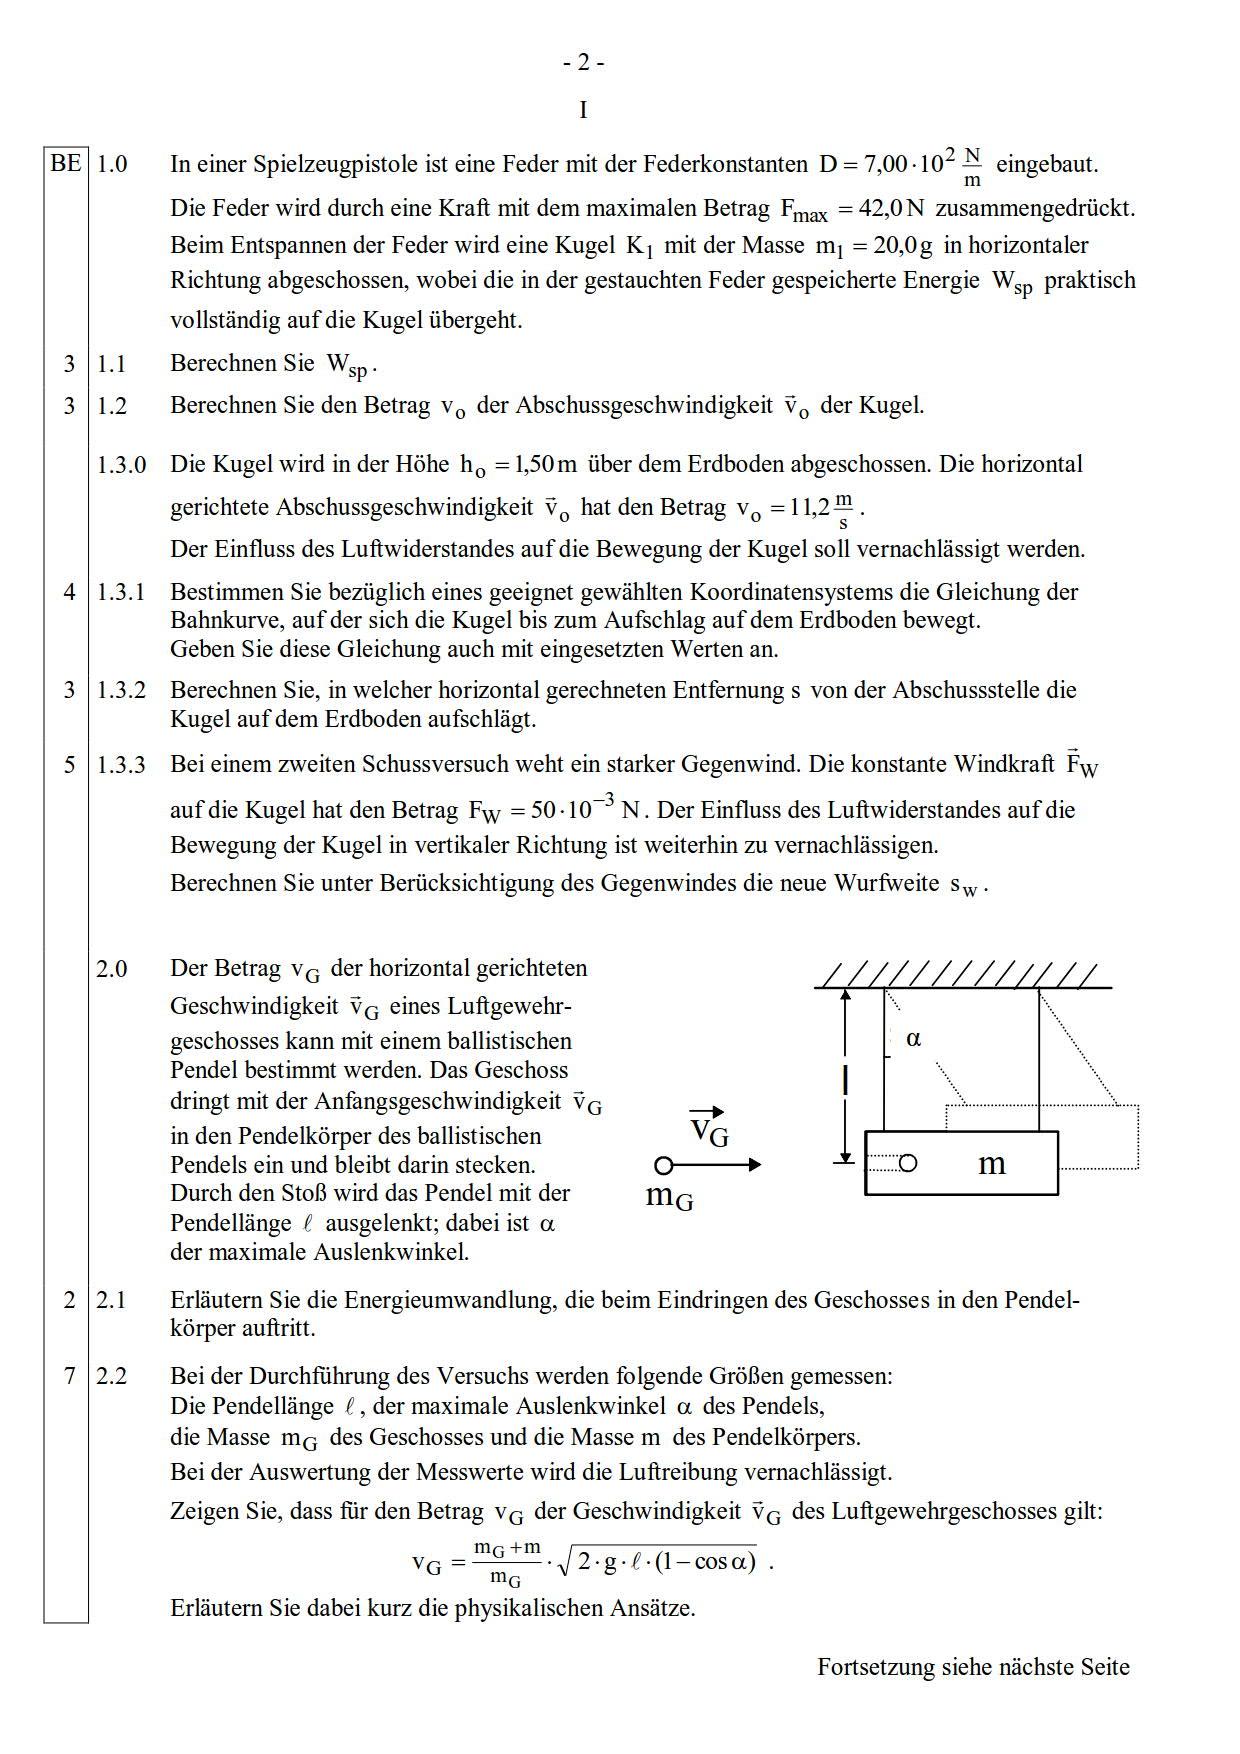 Prüfungsaufgaben - konrad-ulm